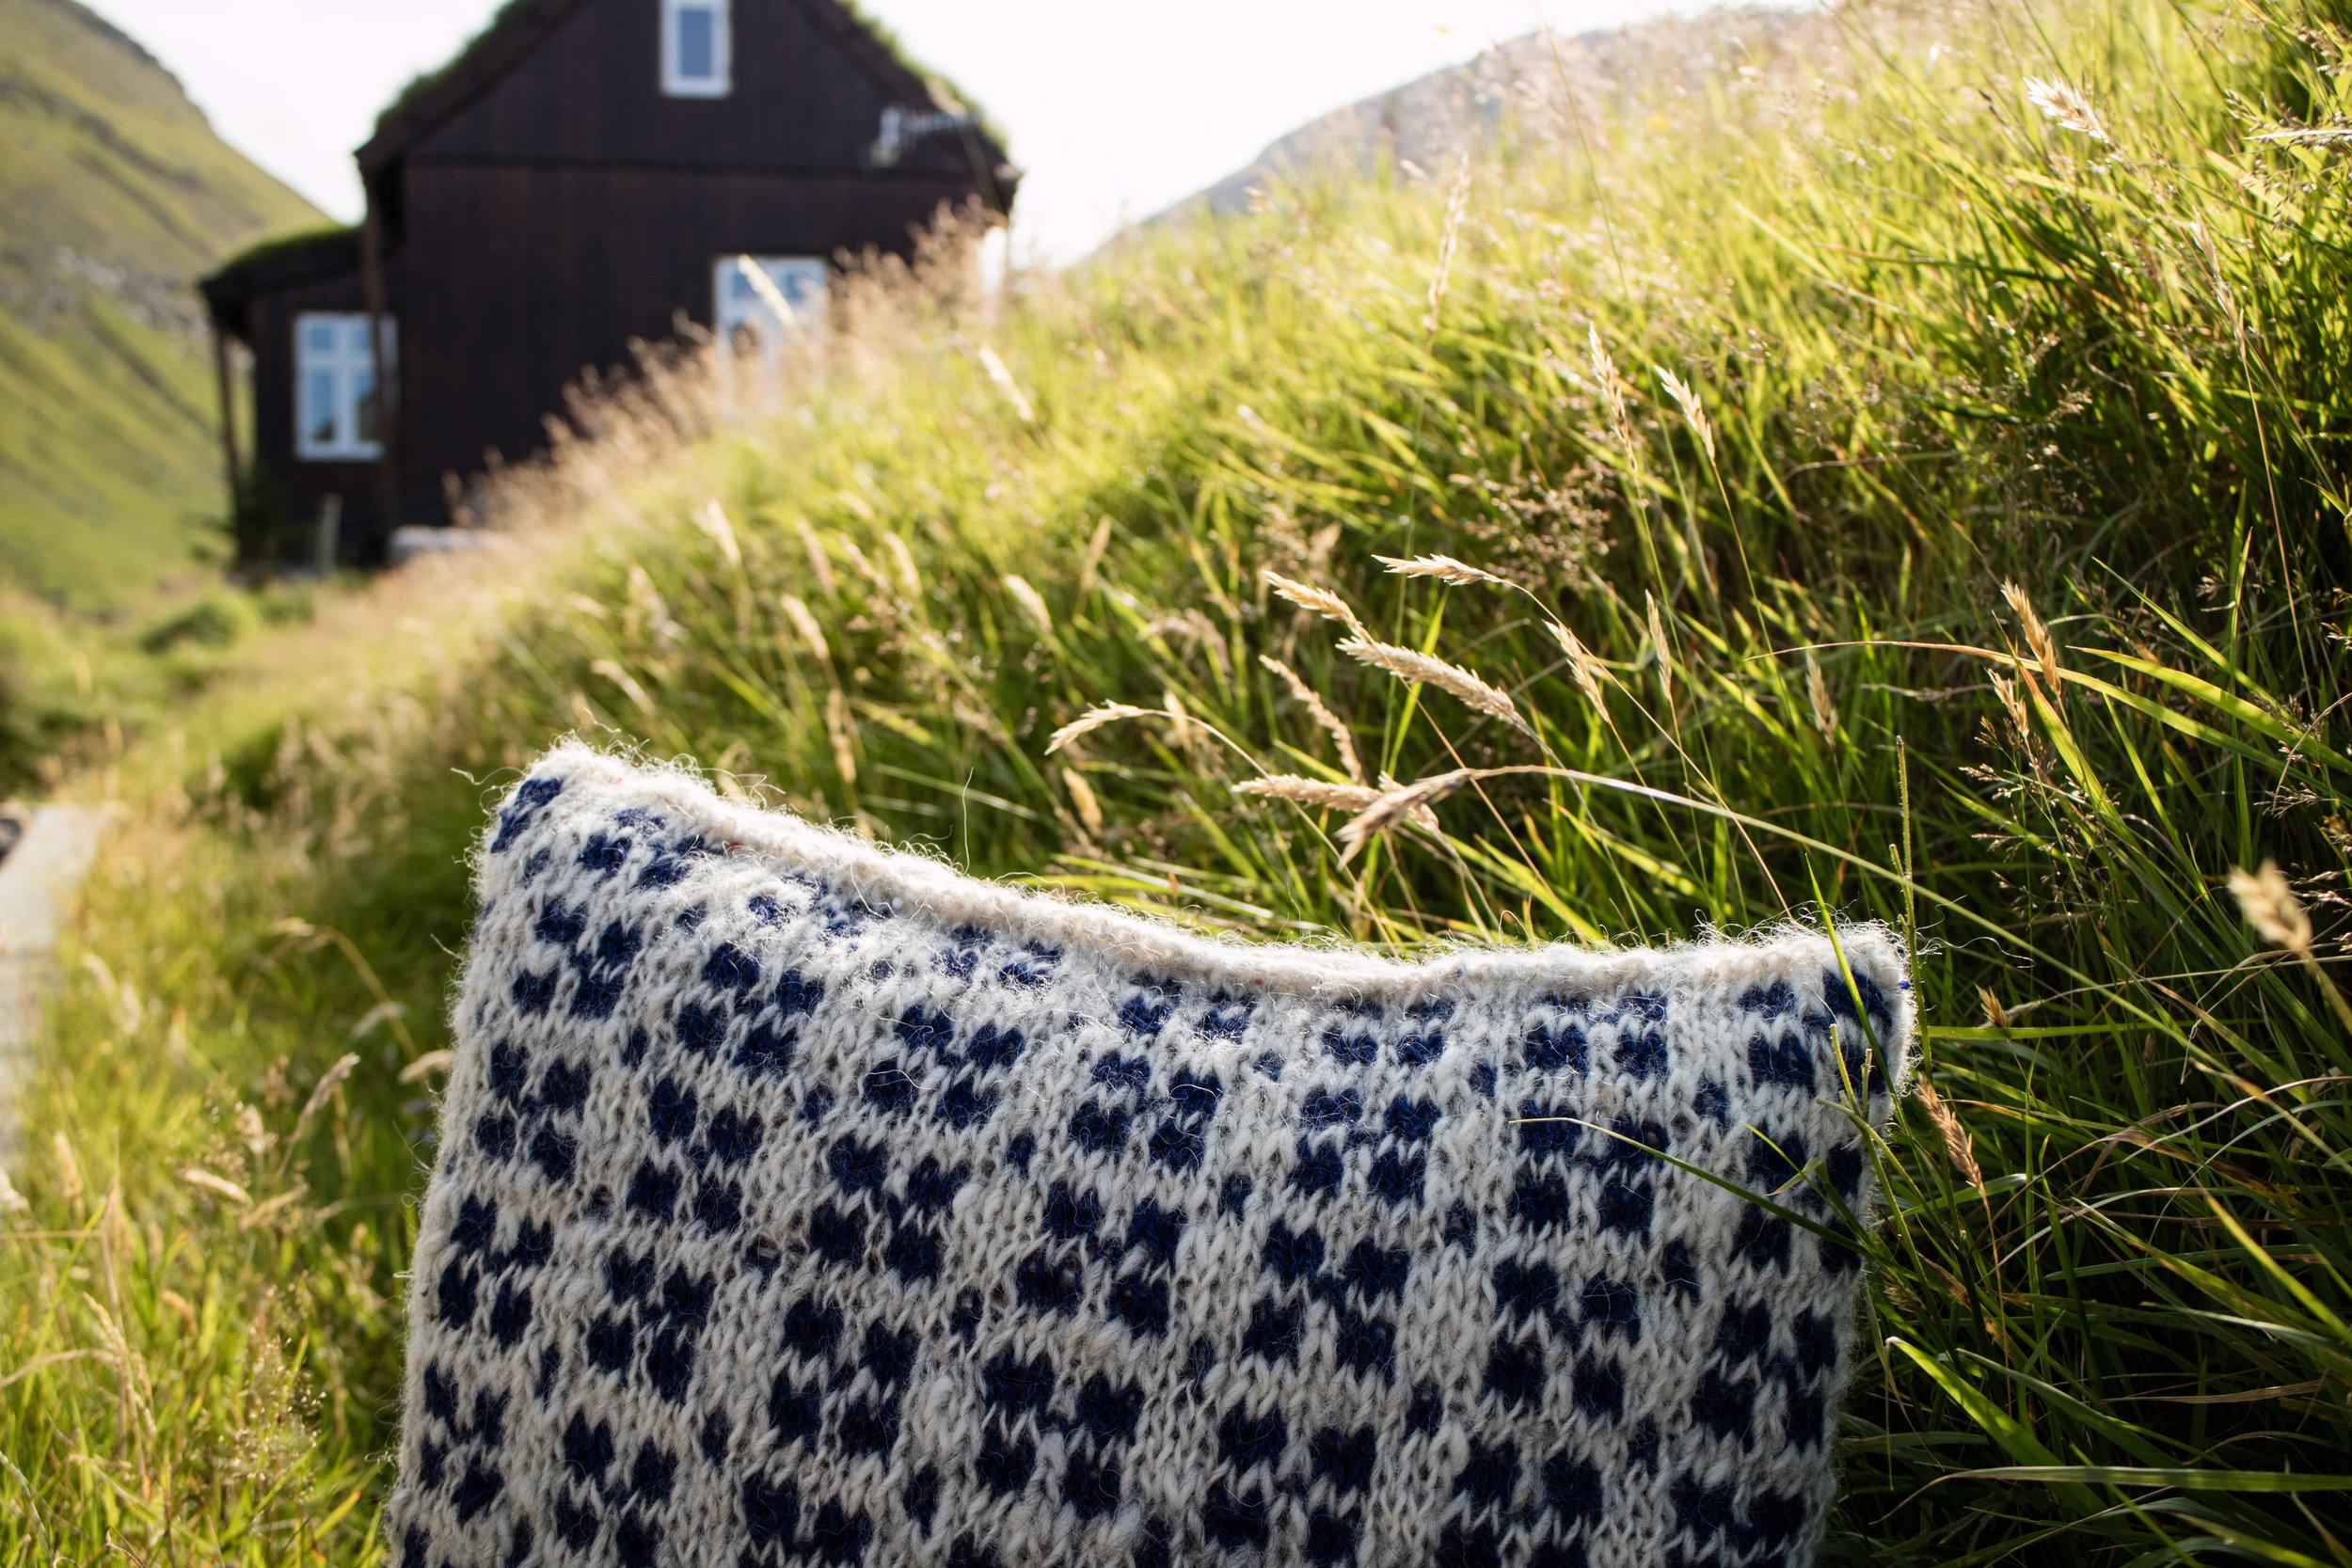 Skattakista Kissen 2 © My Faroe Islands, Anja Mazuhn  (1 von 1).jpg